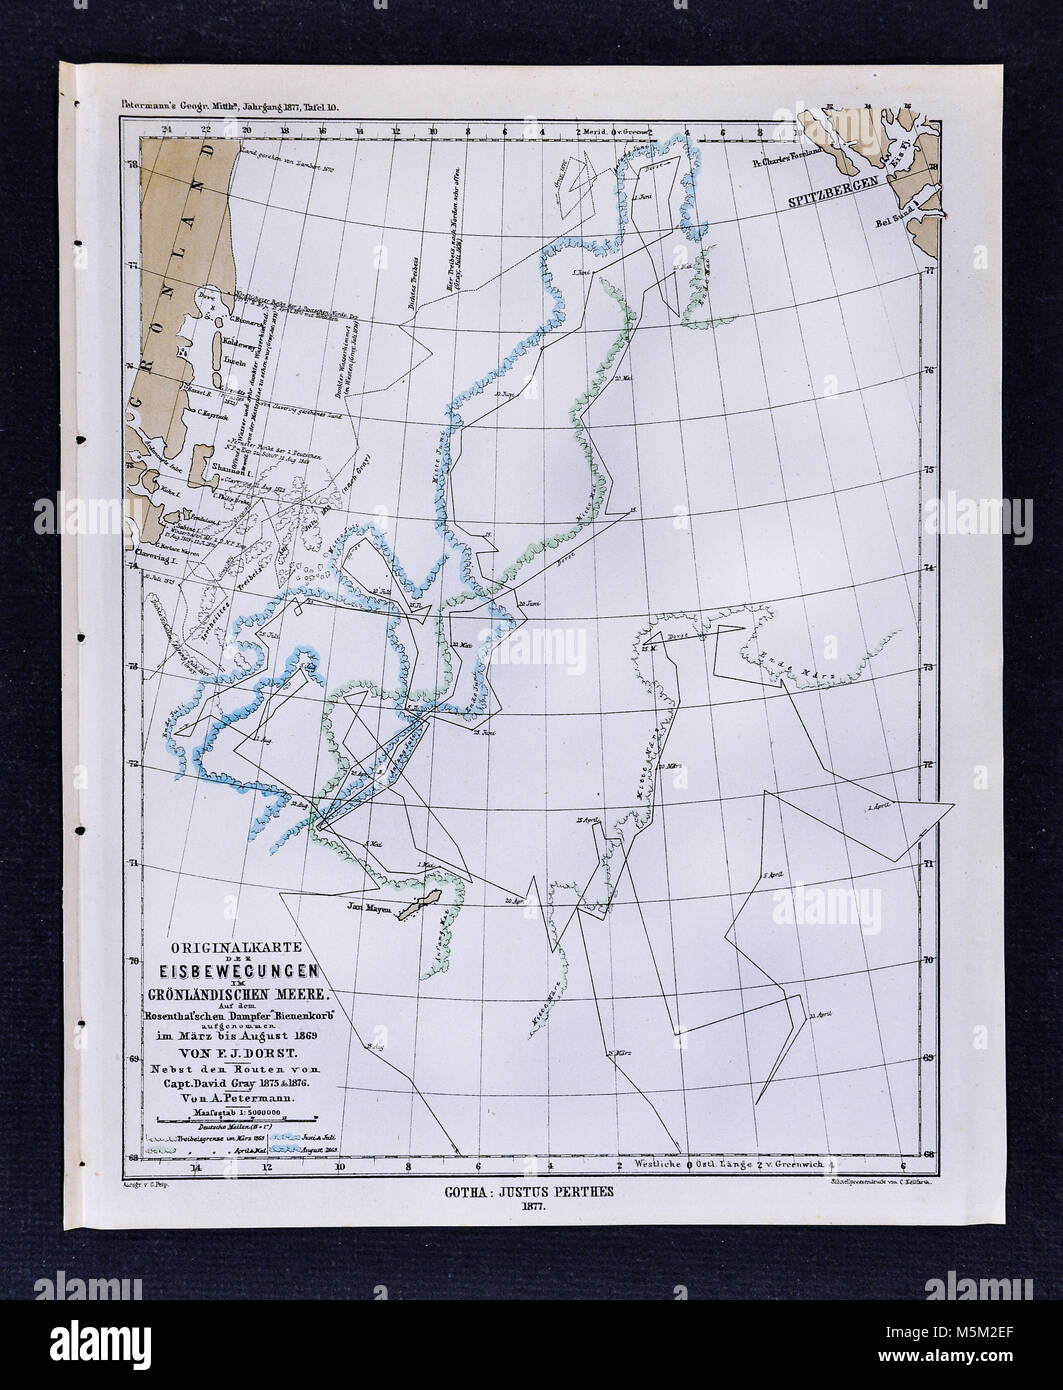 1877 Petermann Mittheilungen mappa - Groenlandia e Nord Atlantico iceberg Immagini Stock